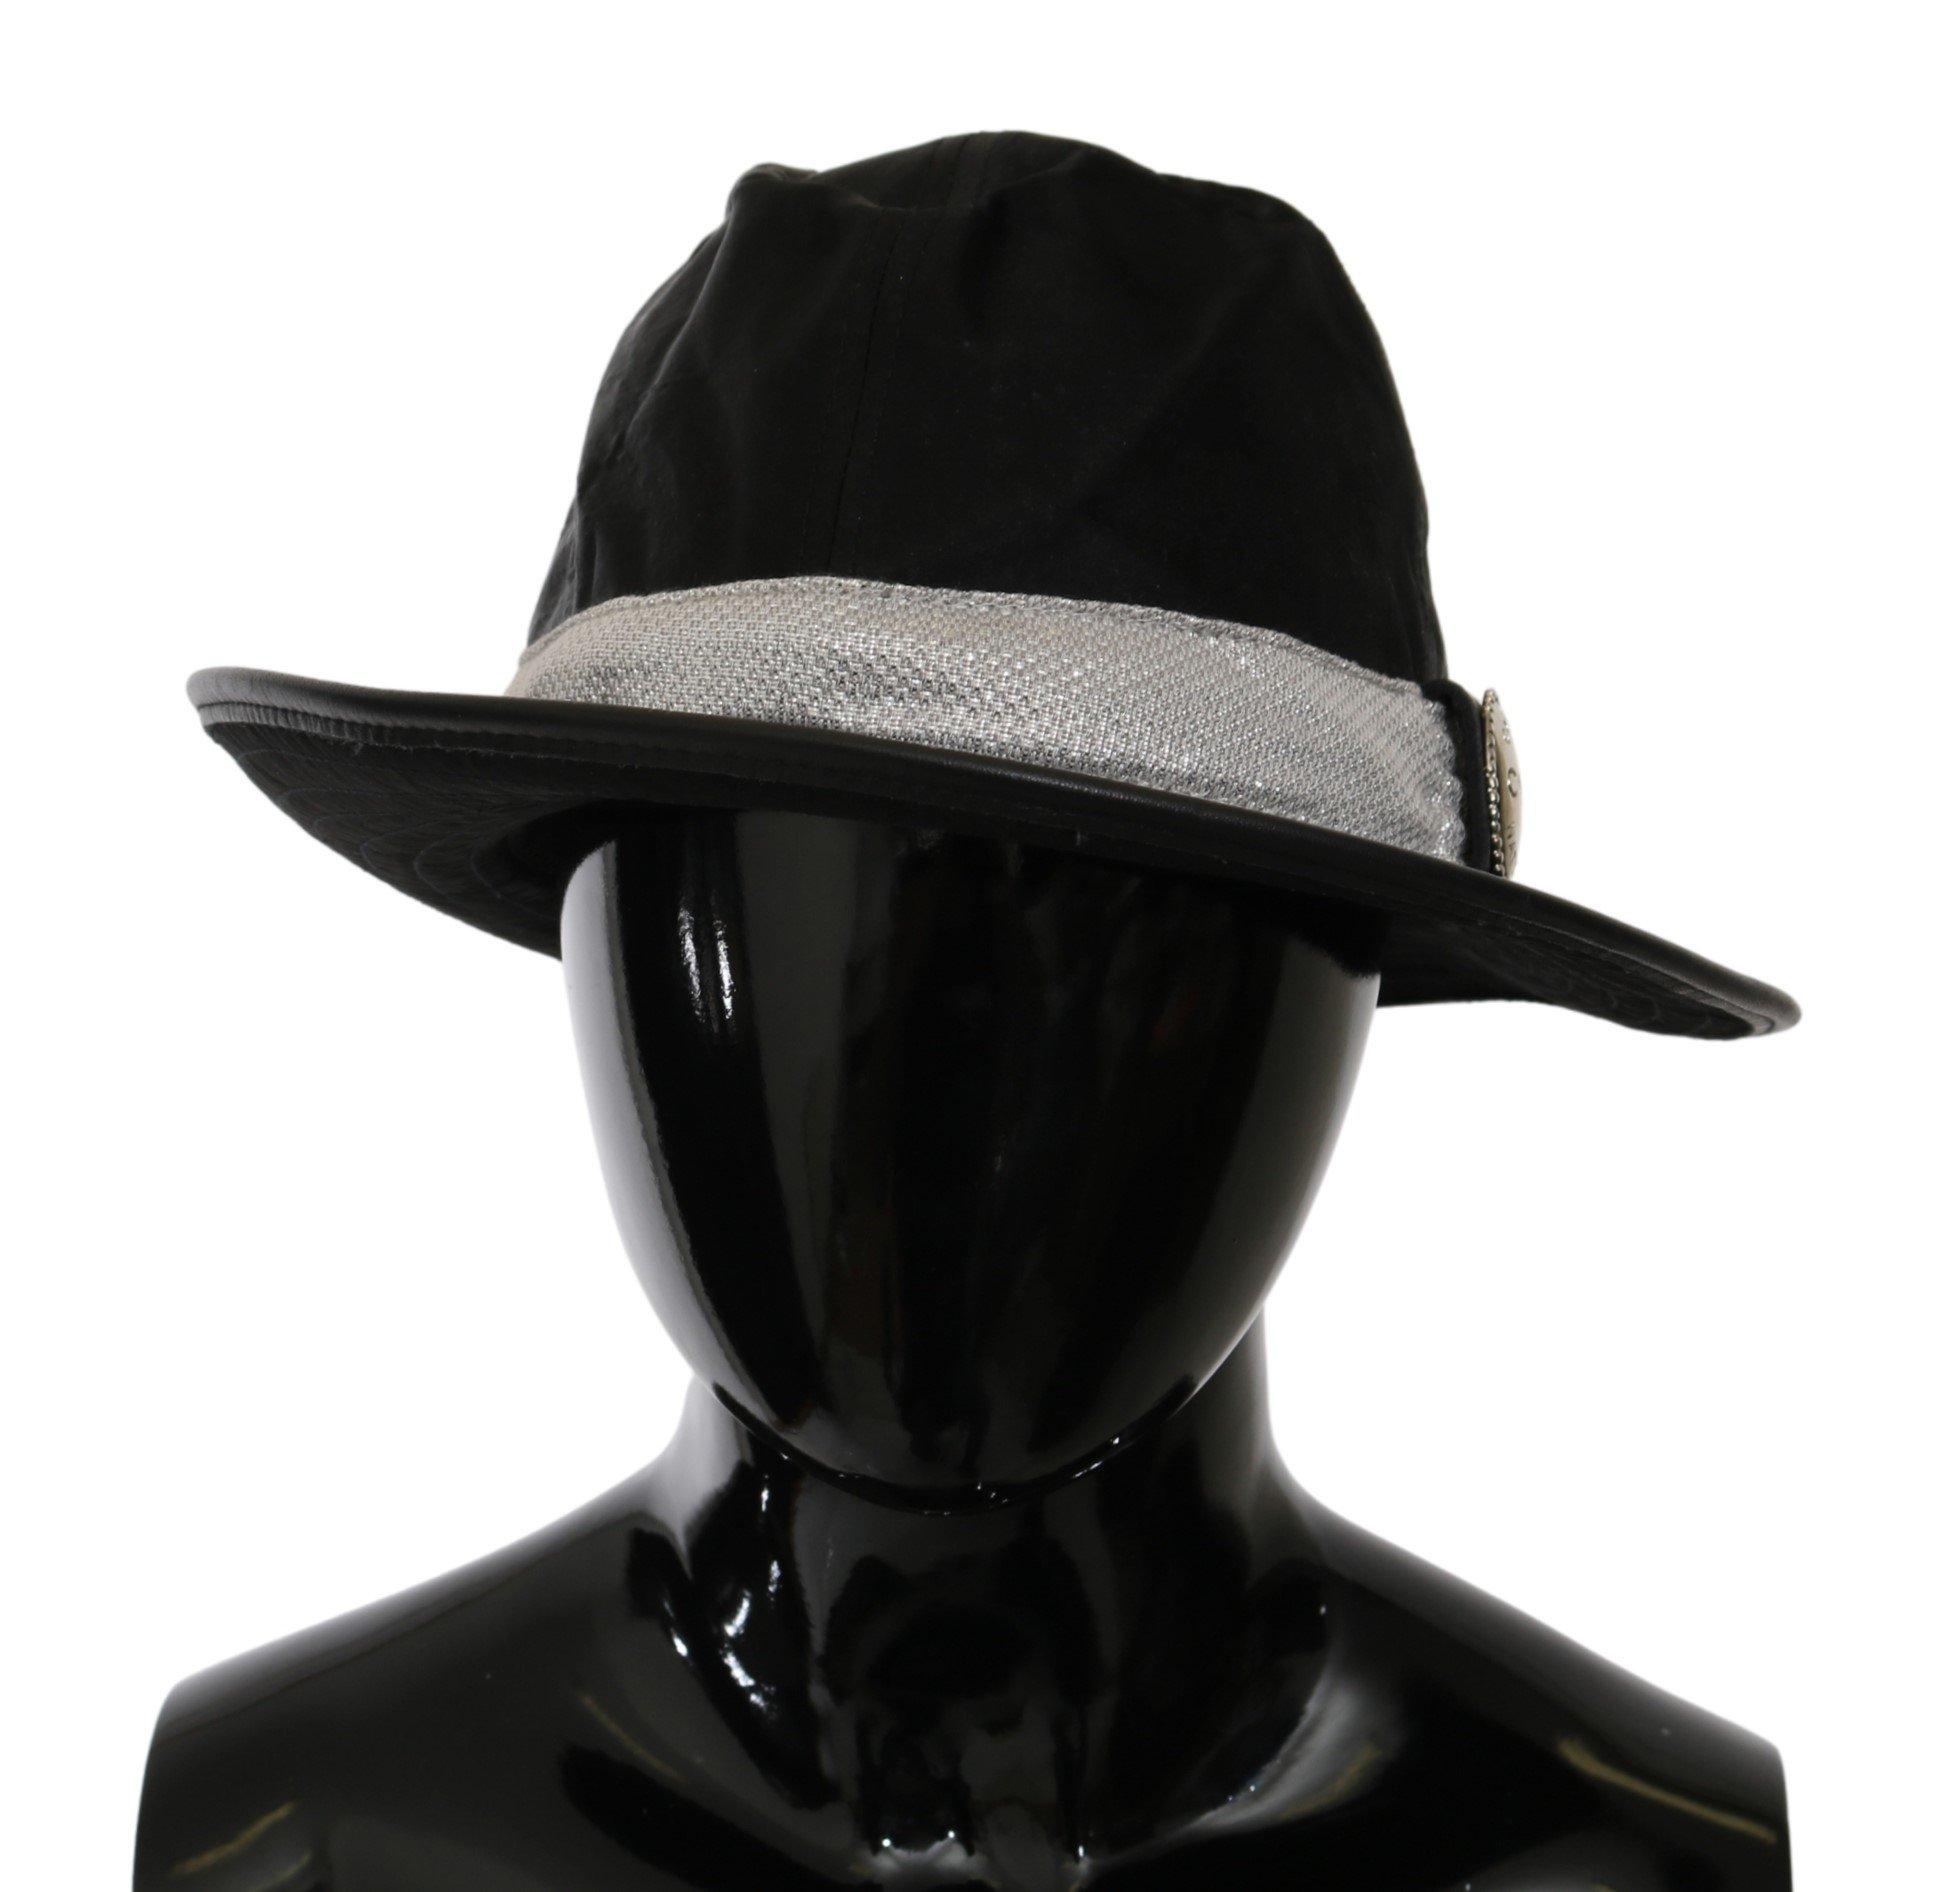 Costume National Men's Classic Wide Brim Floppy Hat Black HAT20000 - 56 cm|XS